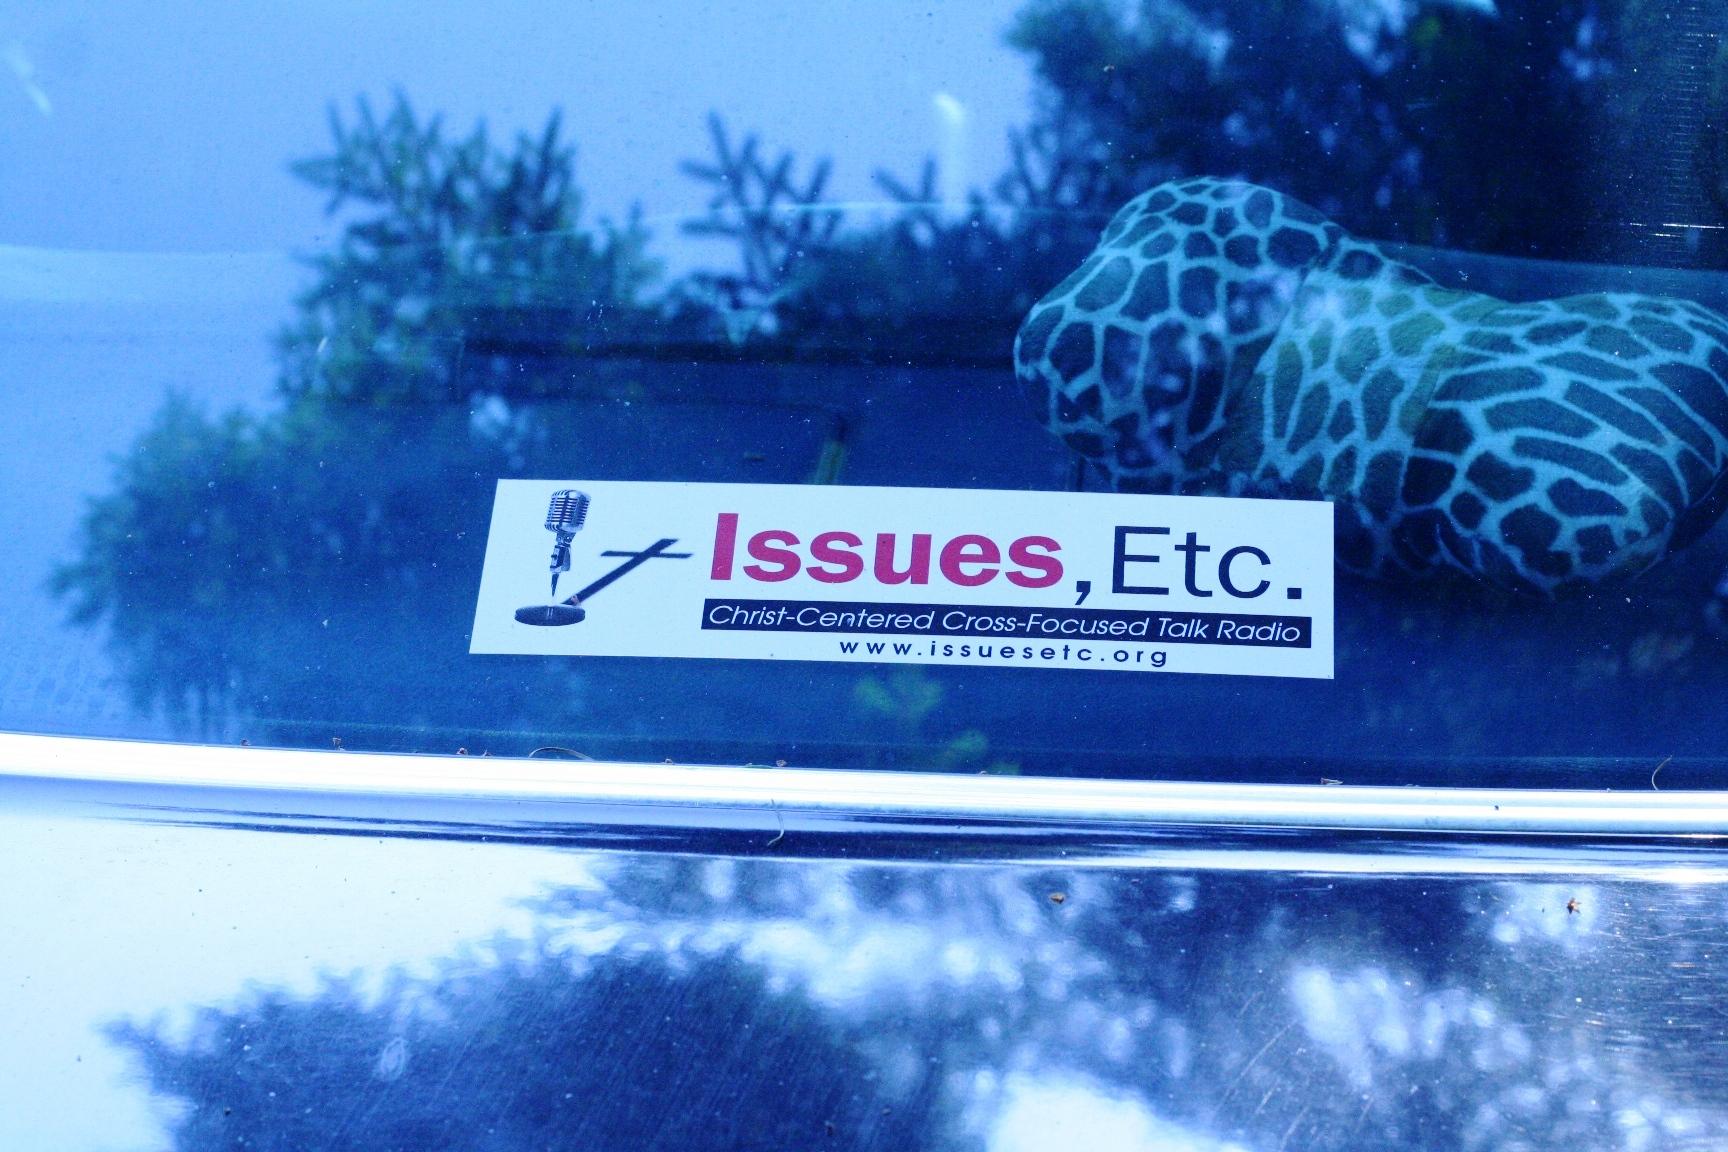 Issues, Etc.